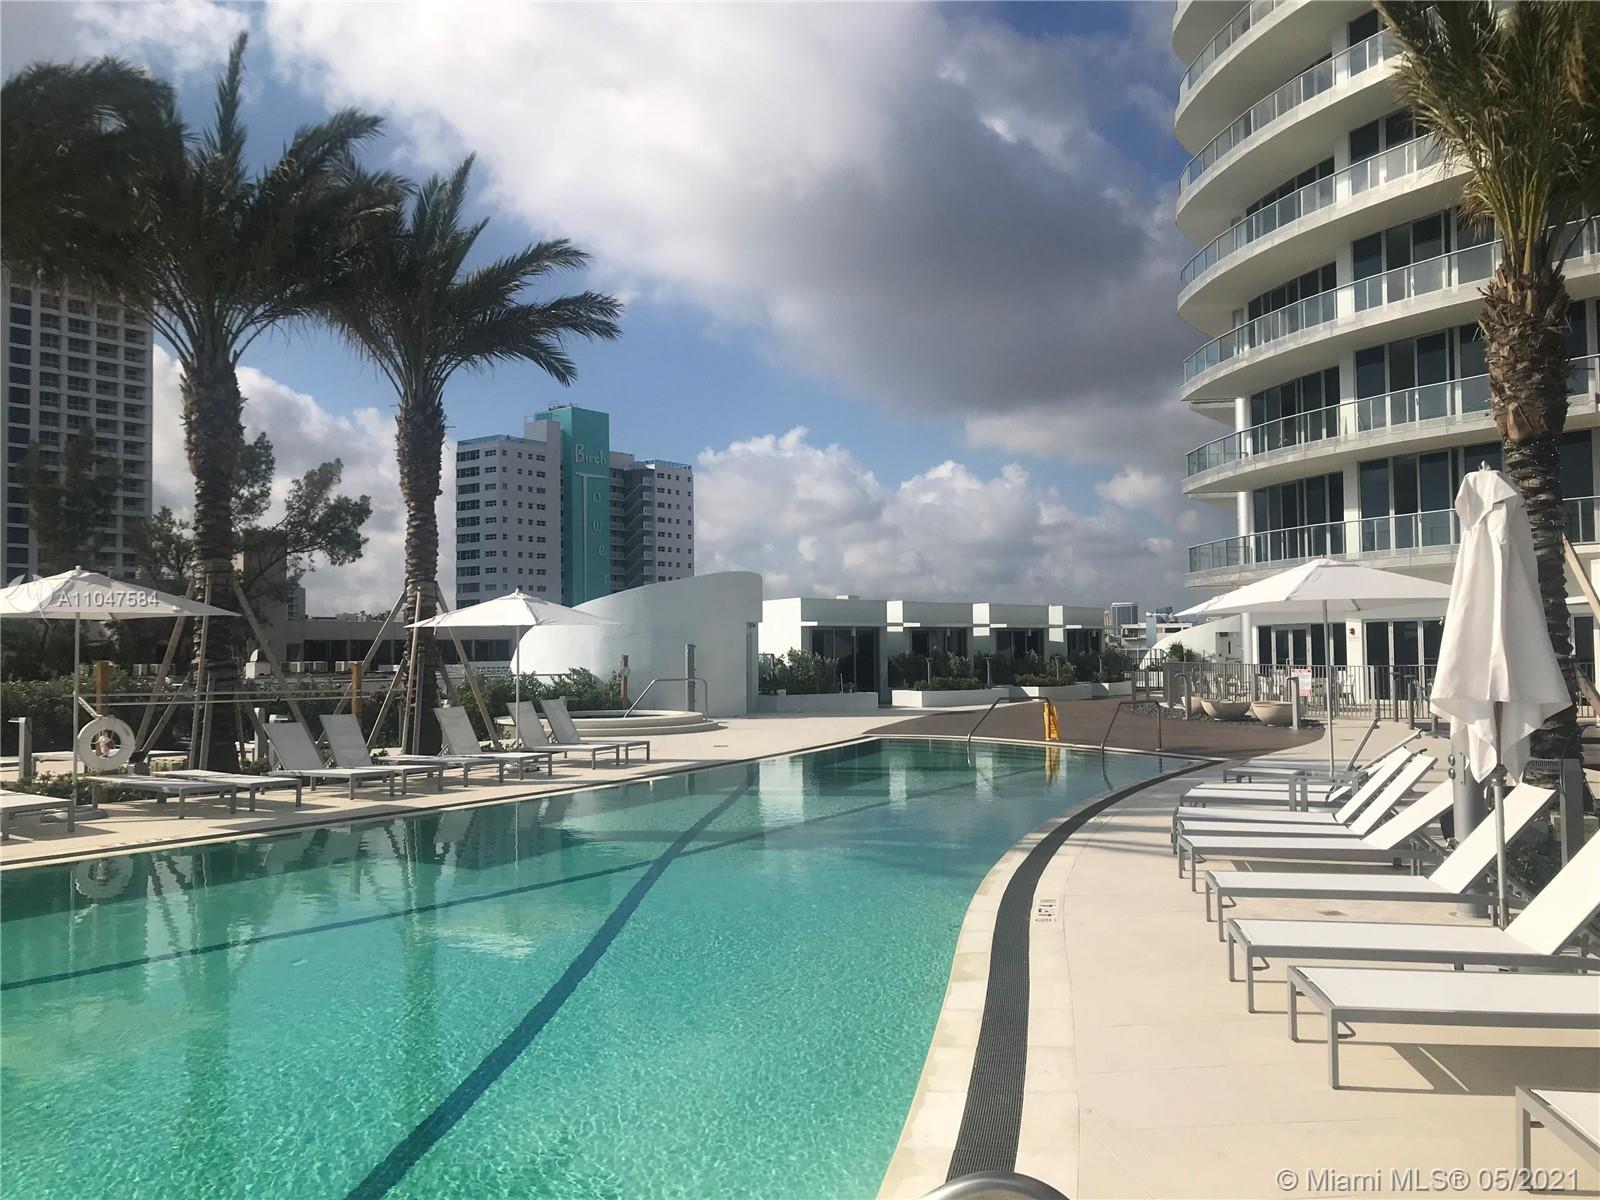 Paramount Fort Lauderdale #1004 - 04 - photo